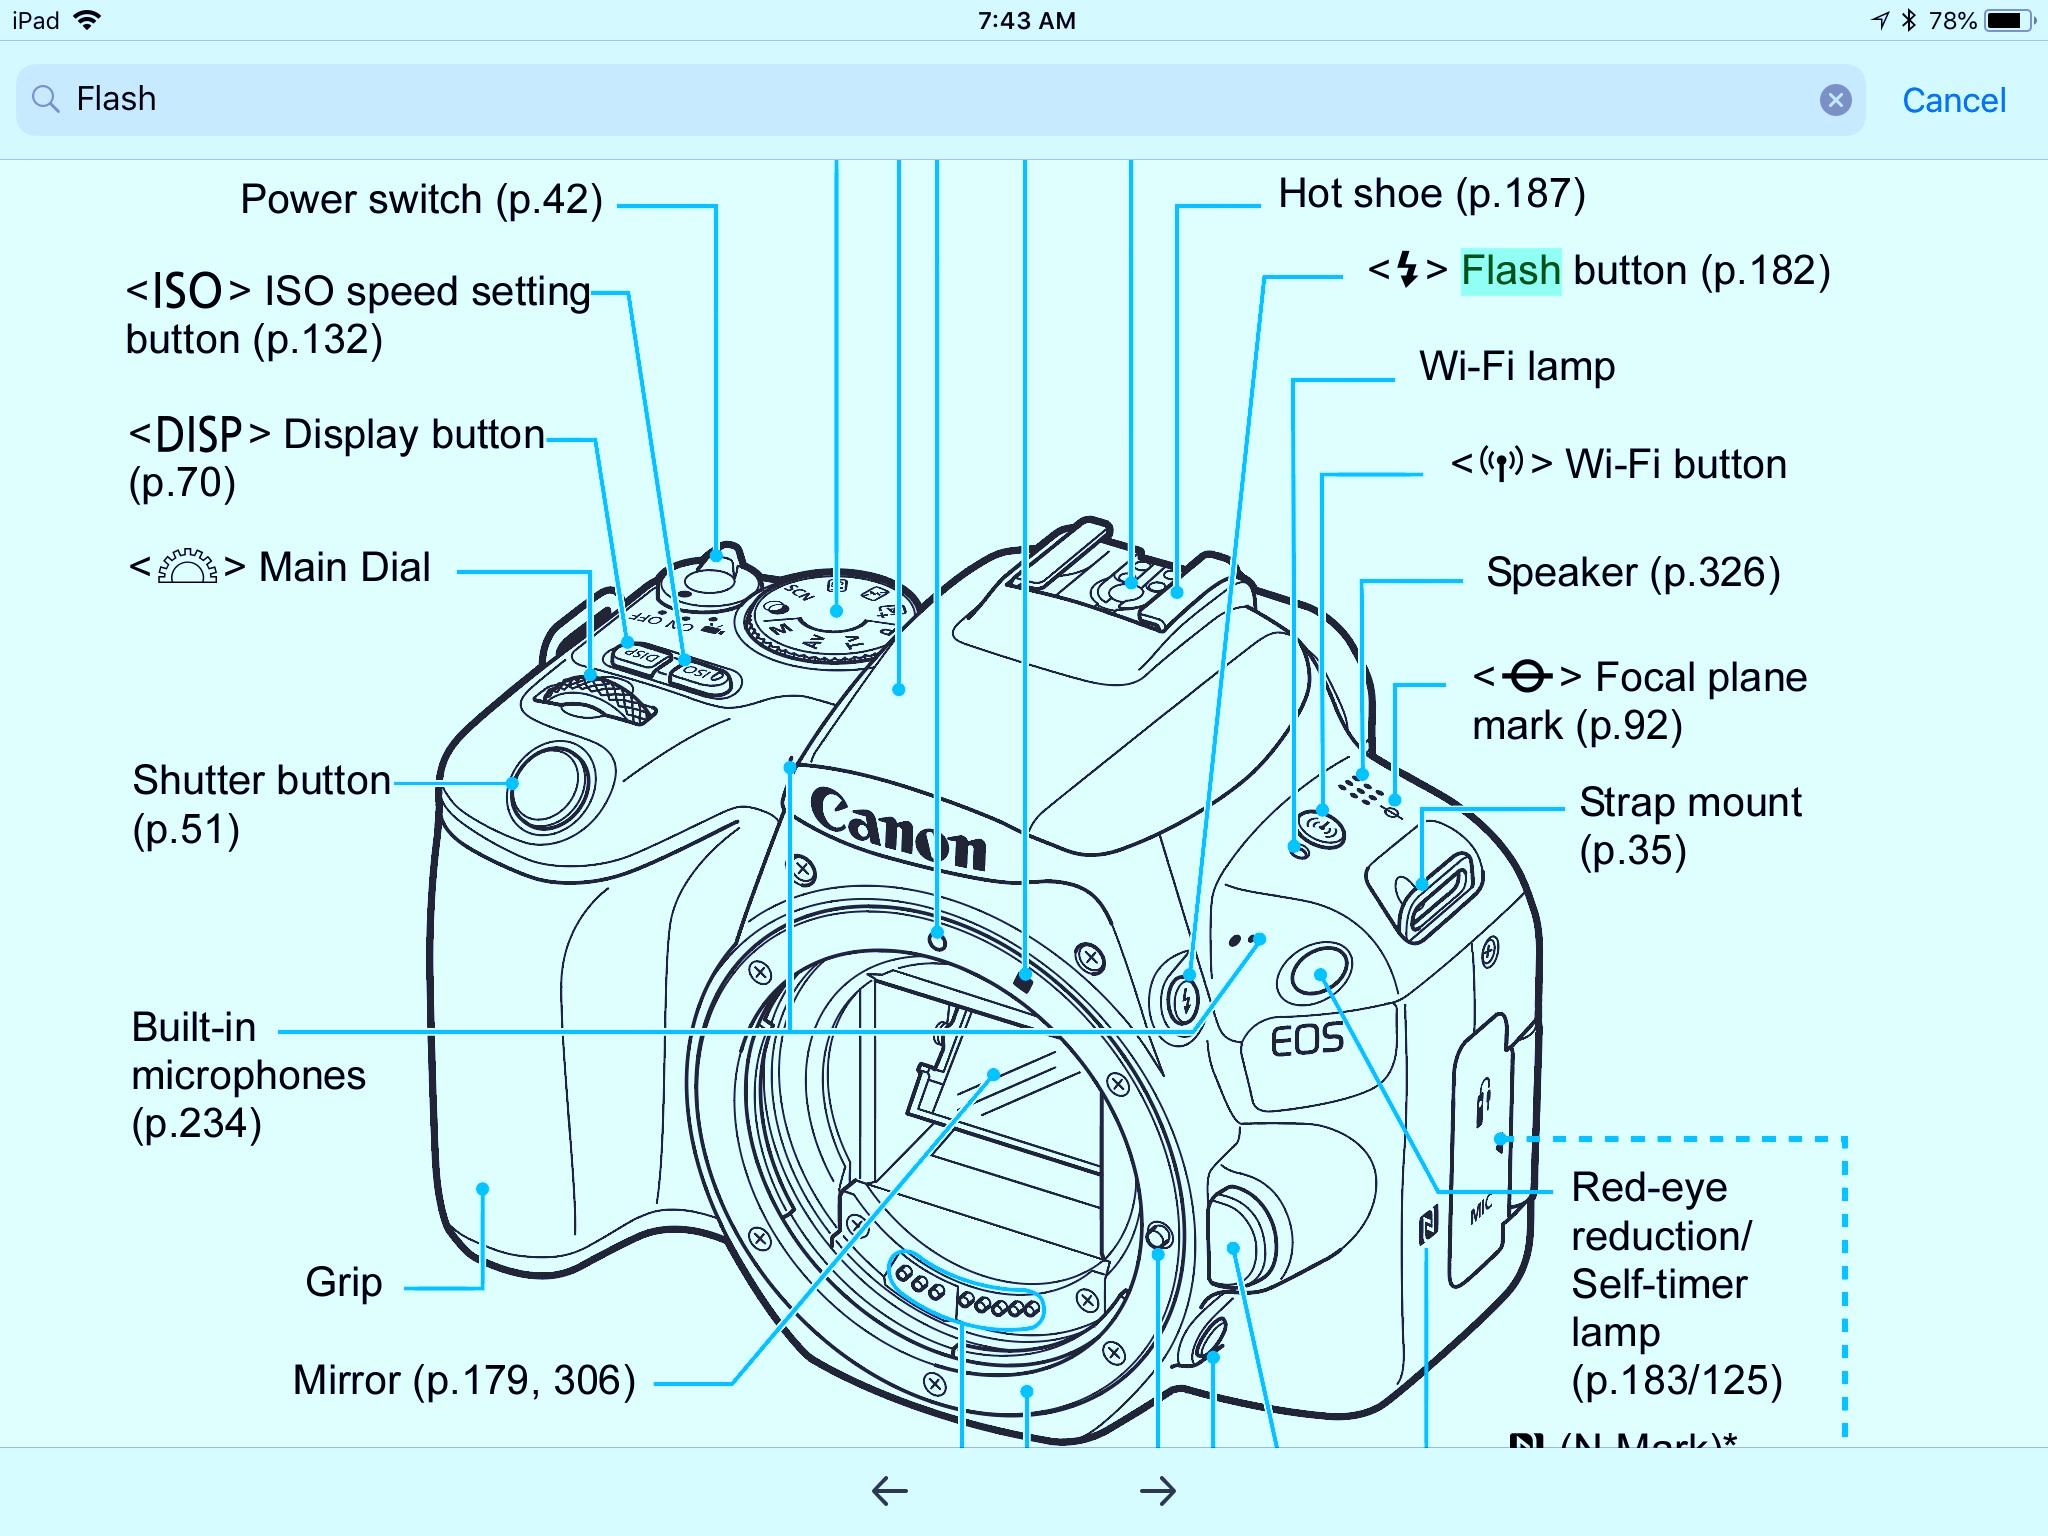 CanonCameraSchematic.G2104.jpg